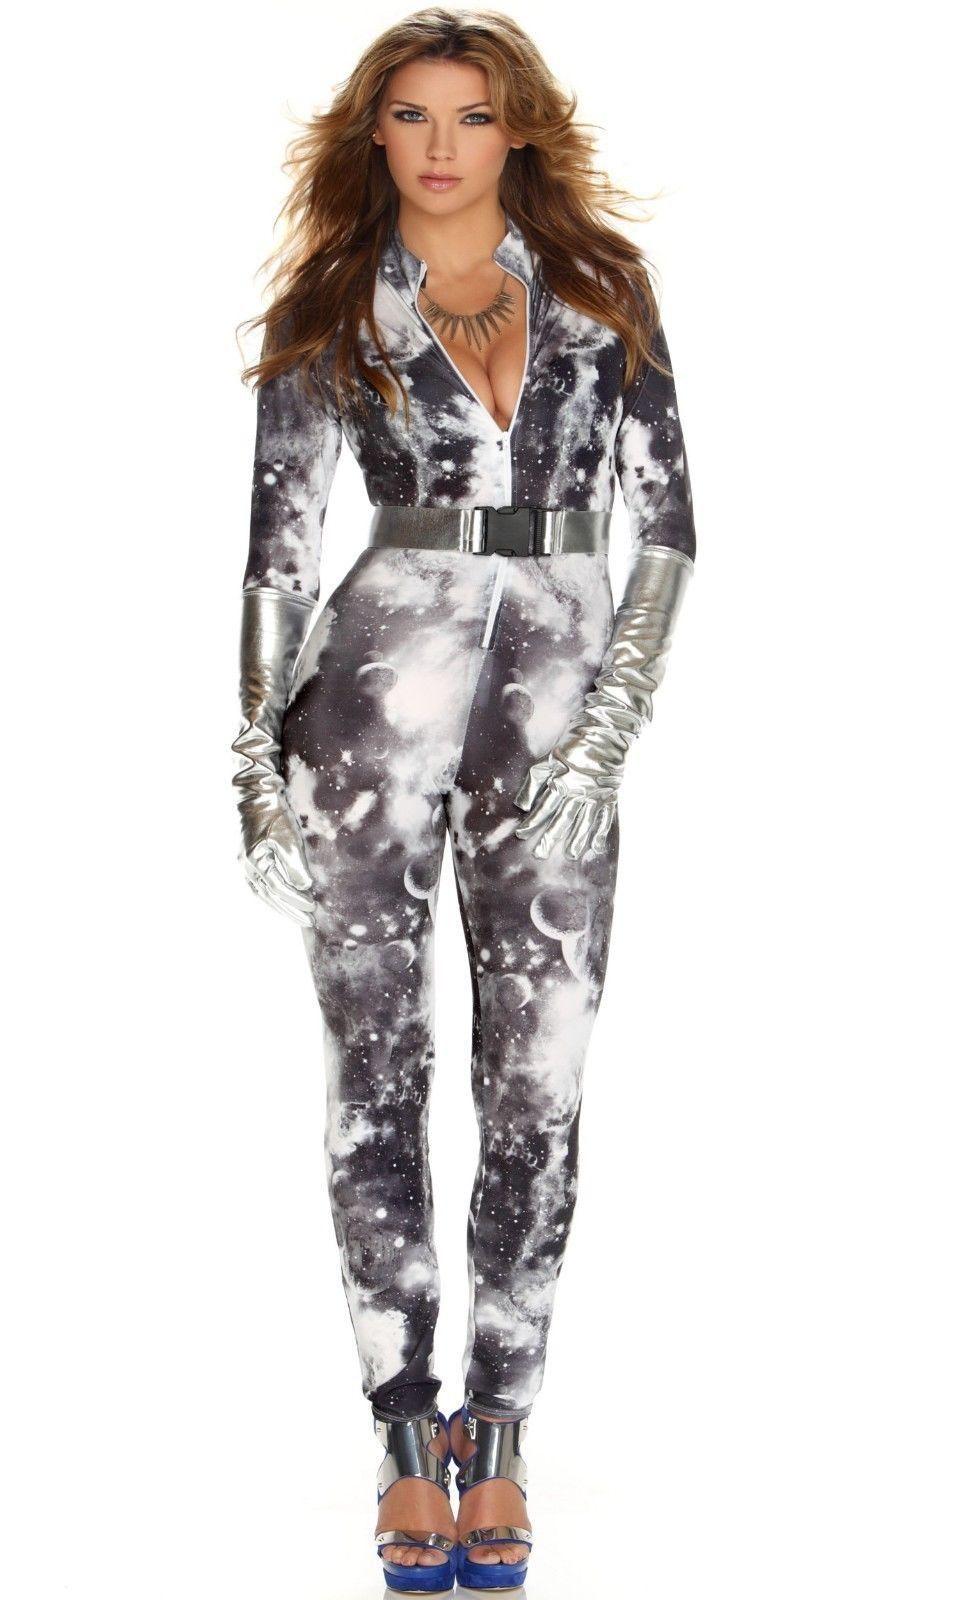 Sexy Forplay Astonishing Astronaut Jumpsuit Women Costume 3pc Set 553406 - $56.99